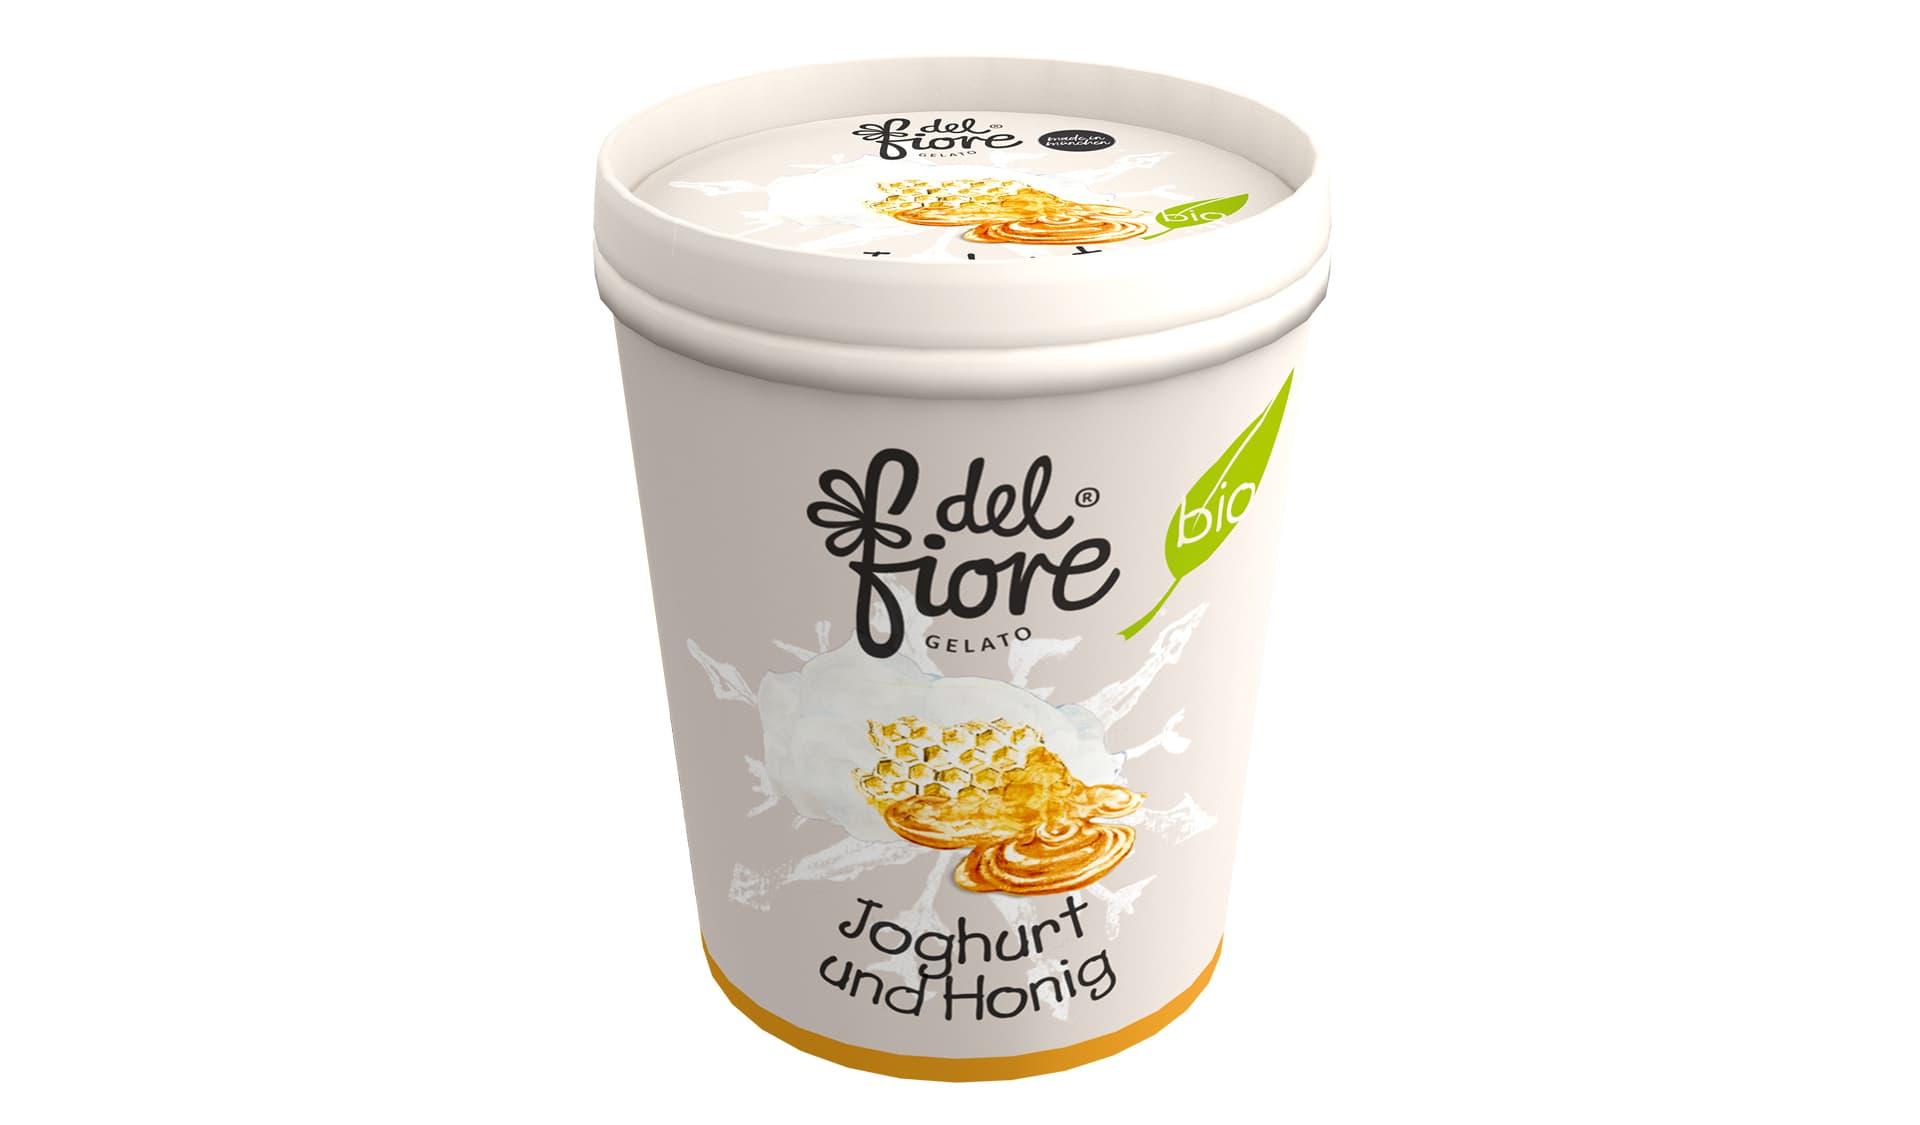 Del Fiore Joghurt und Honig (www.delfiore.de)